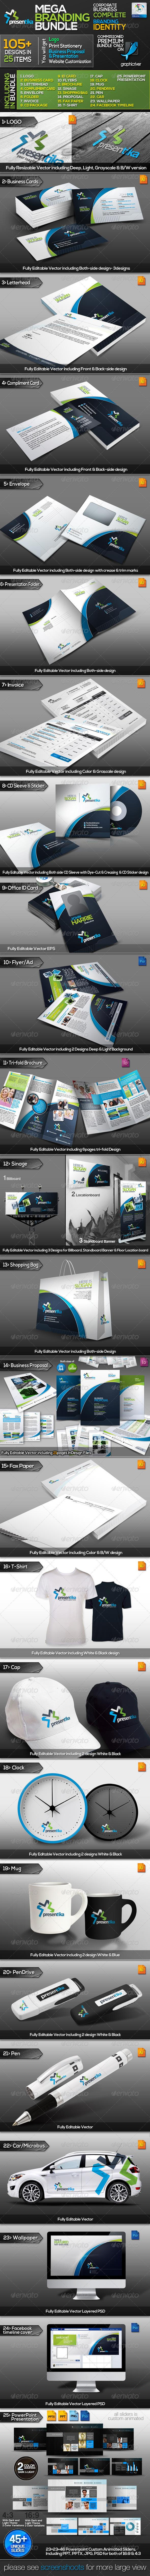 Presentica Business Identity Mega Branding Bundle